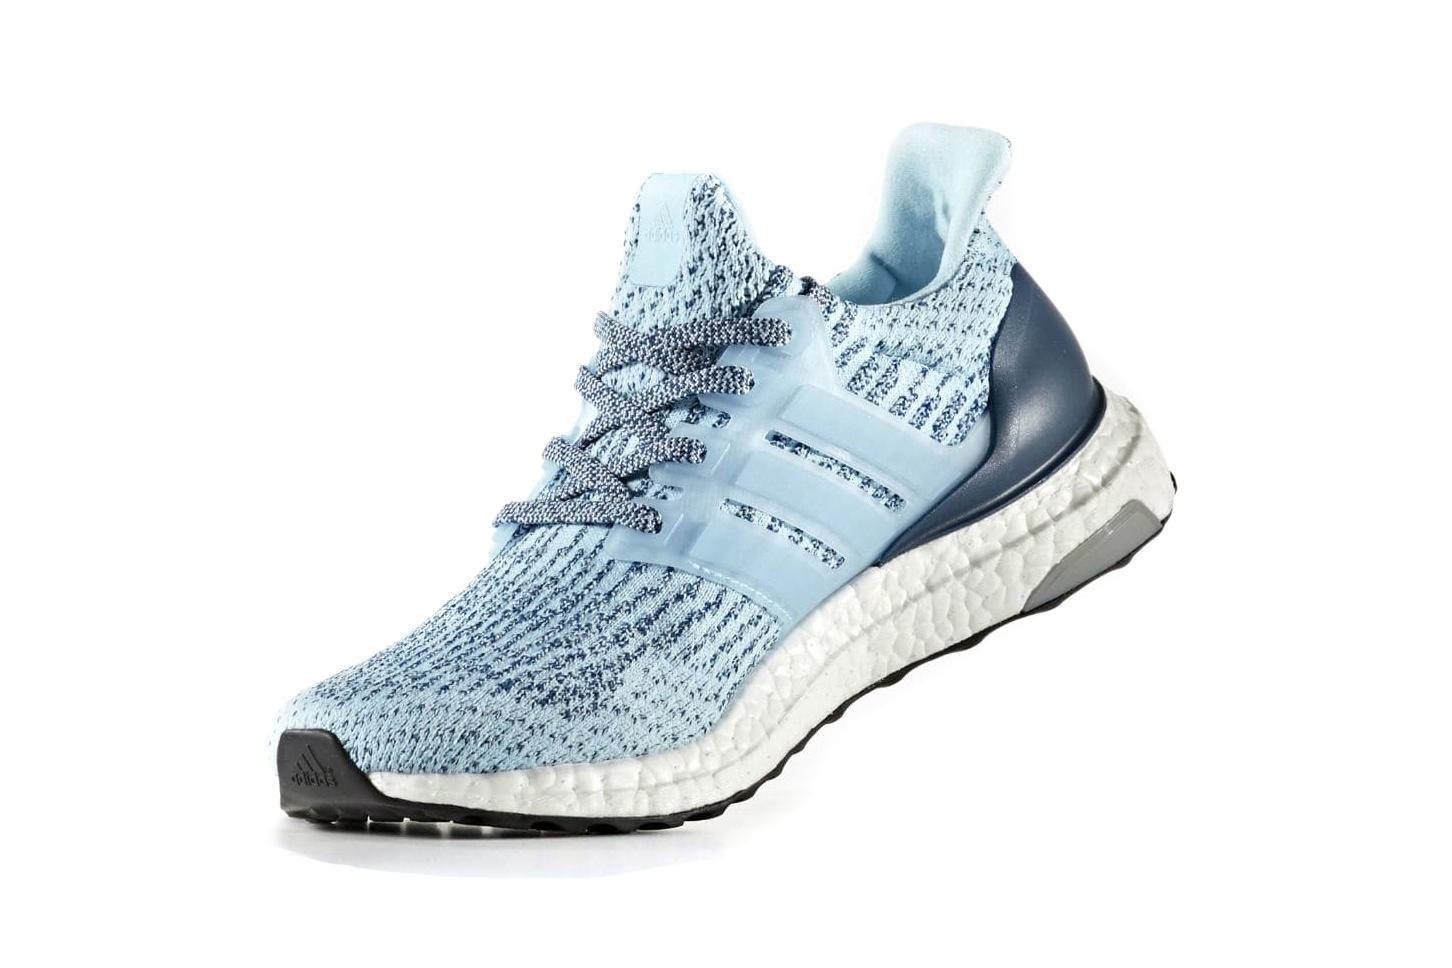 adidas-ultraboost-3-0-icy-blue-1